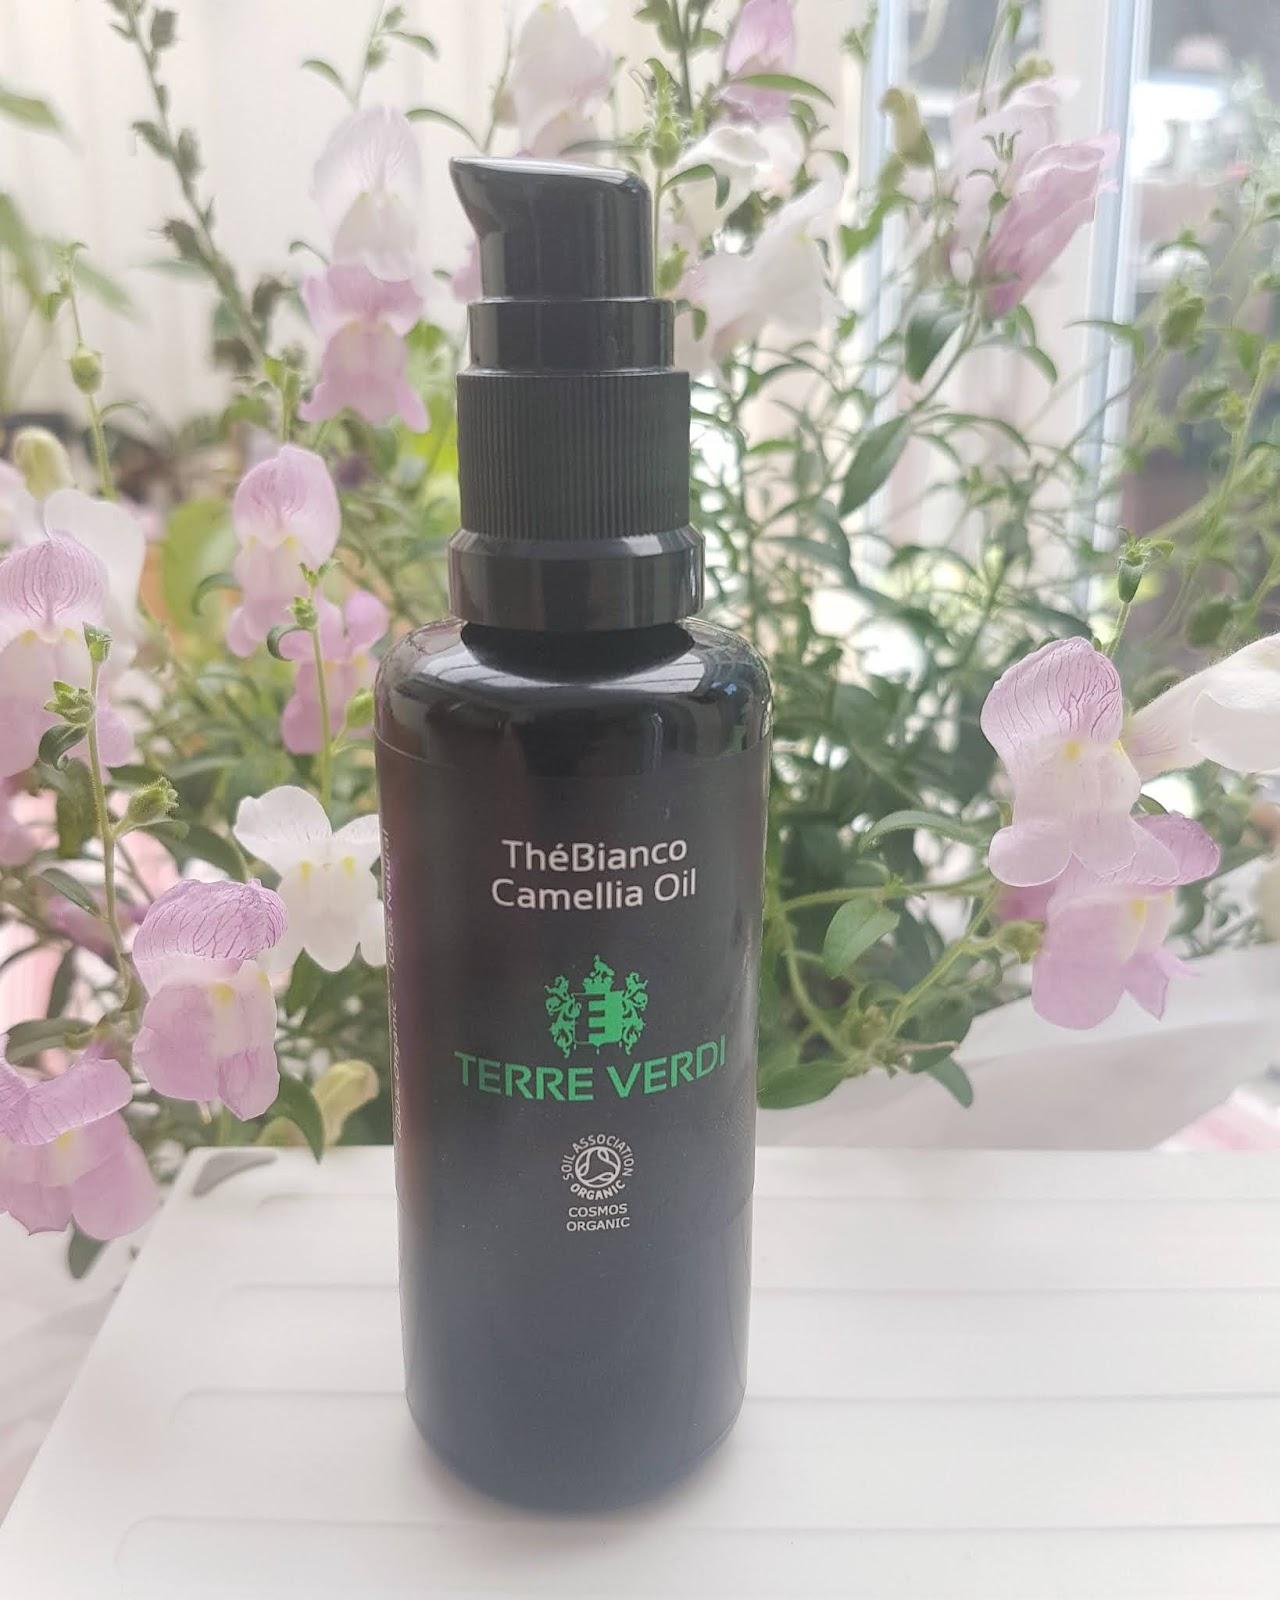 Terre Verdi The Bianco Camellia Oil Review